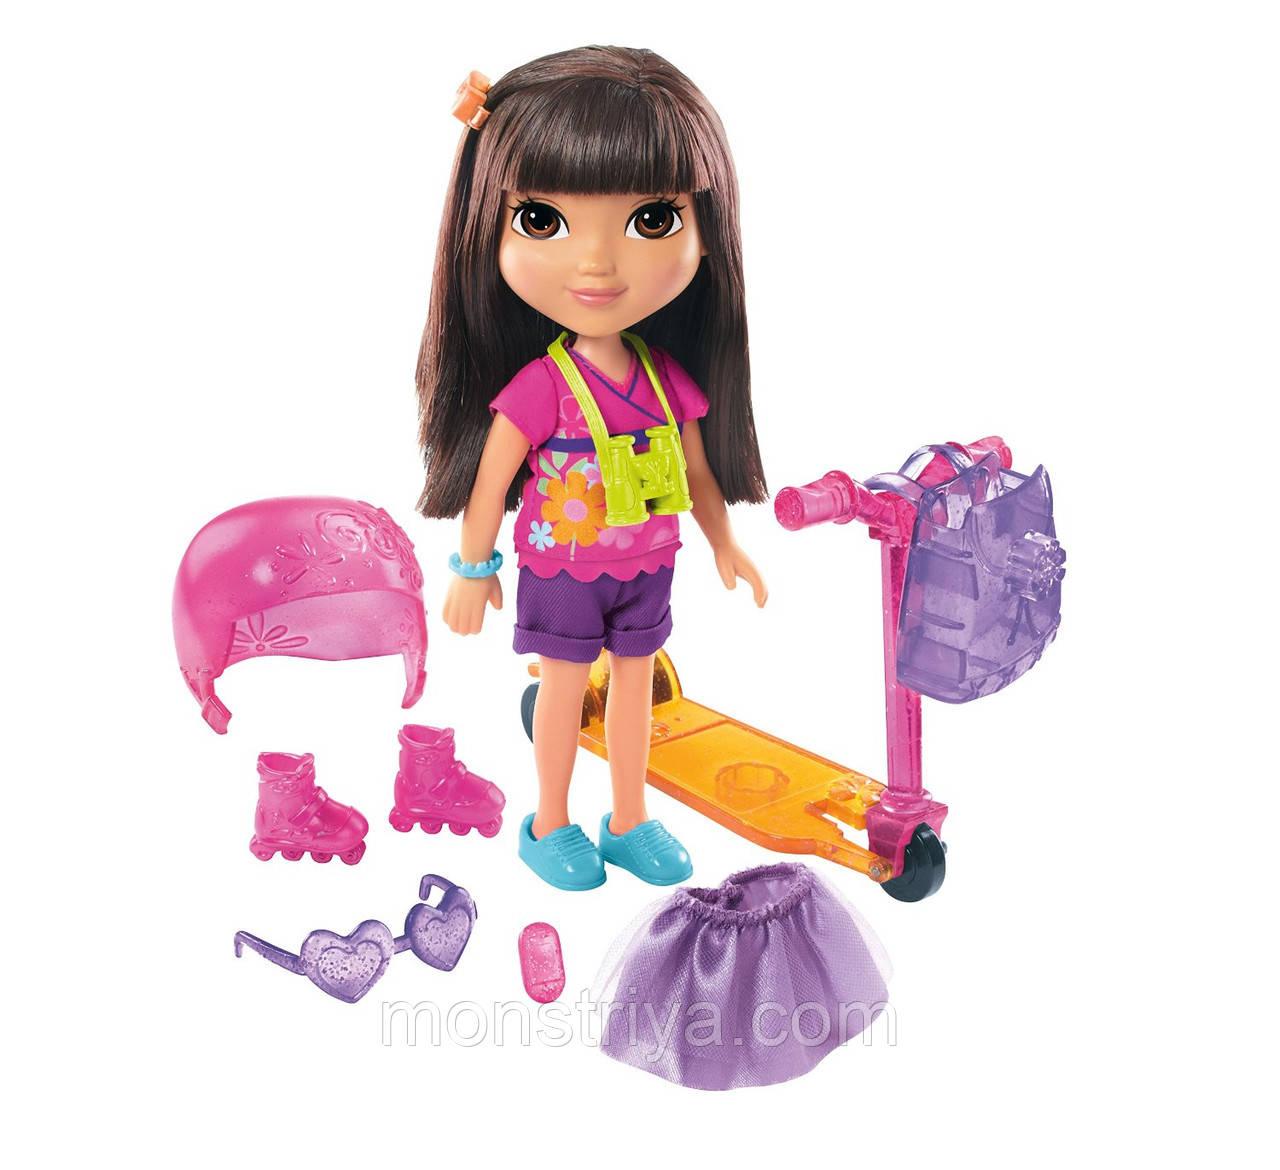 Кукла Даша Следопыт, путешественница Dora